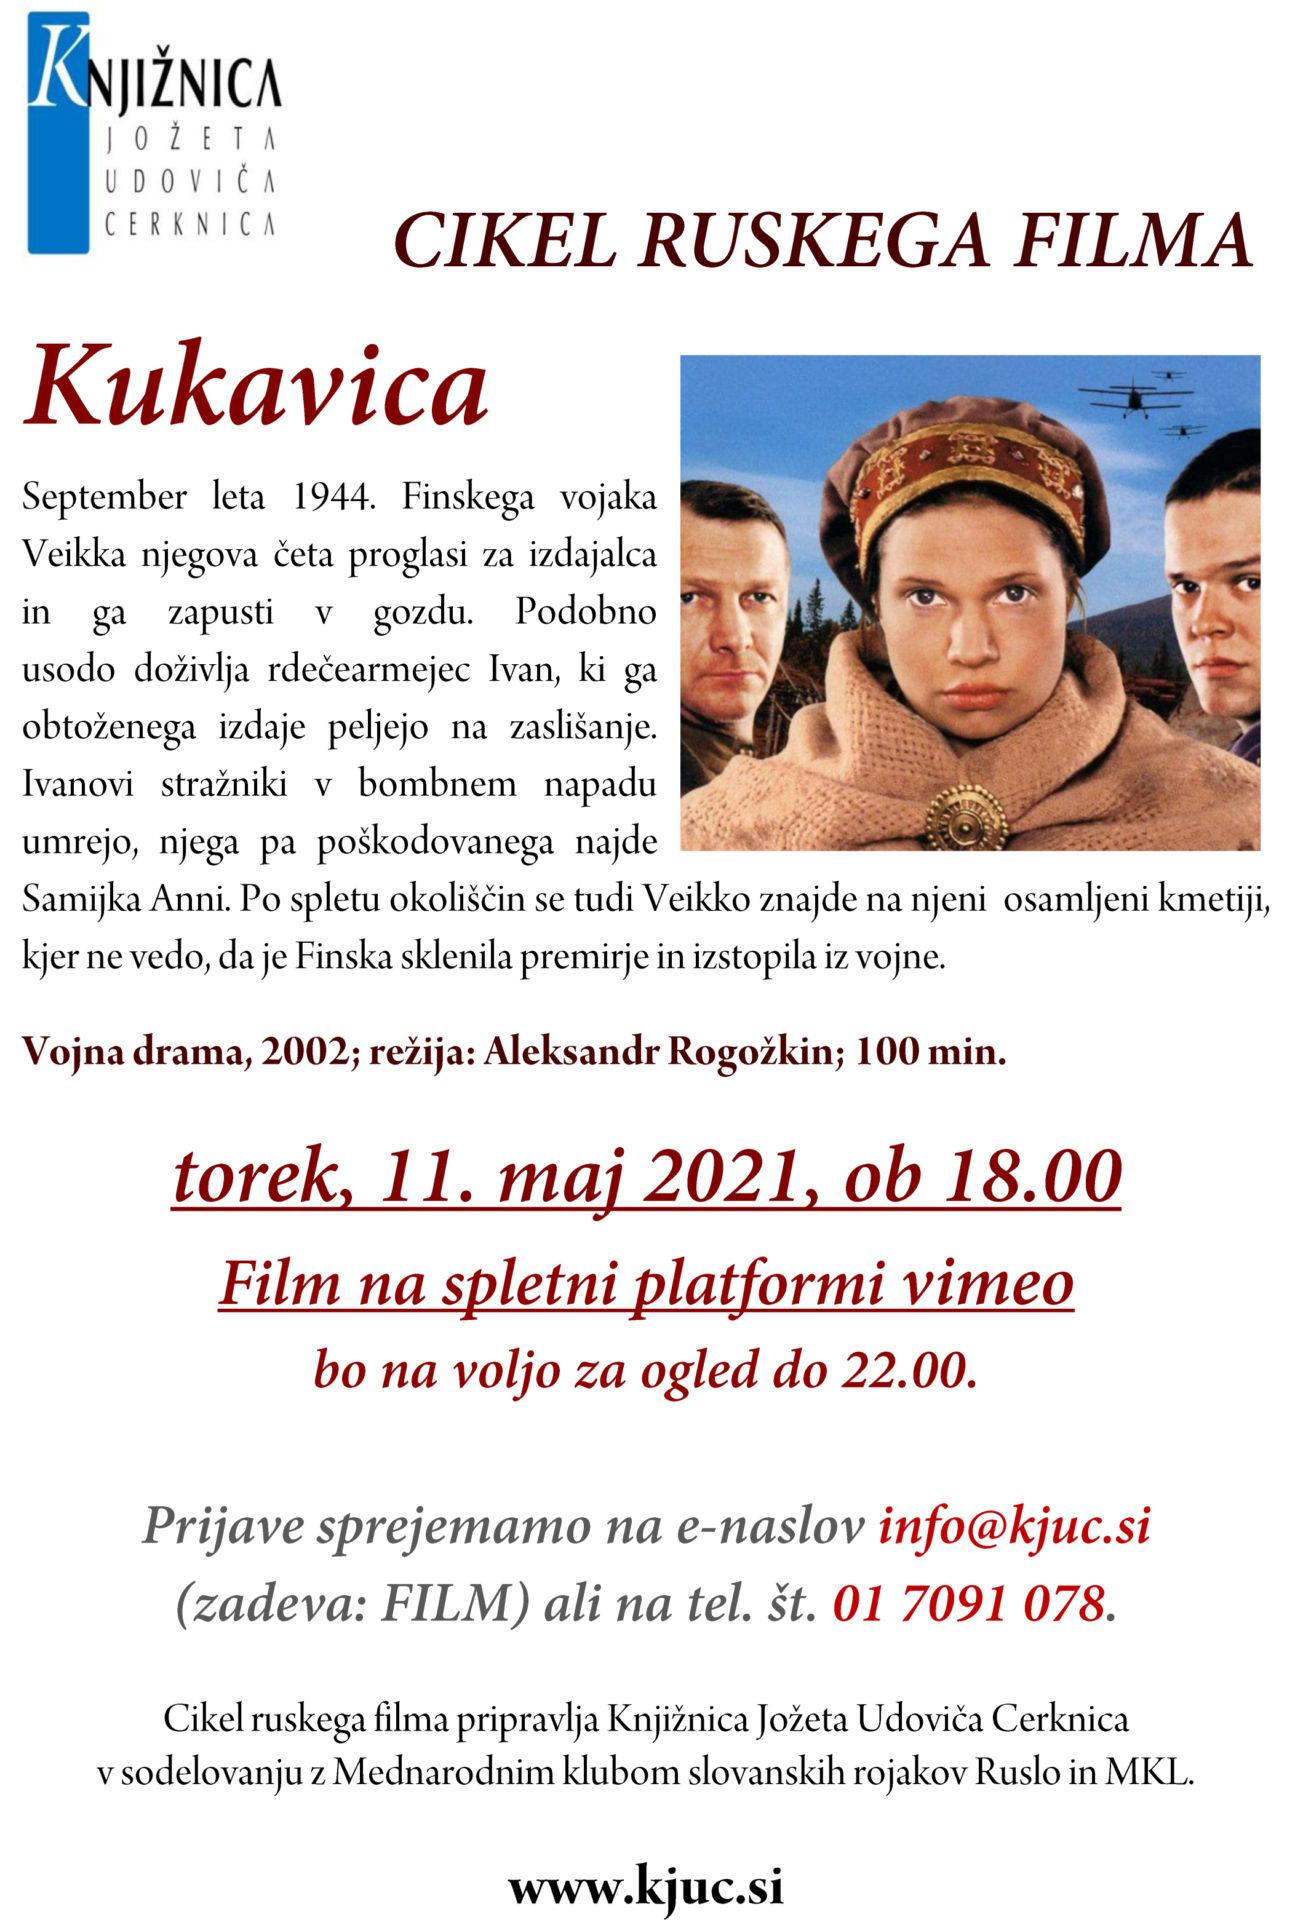 Kukavica - Kukavica - cikel ruskega filma